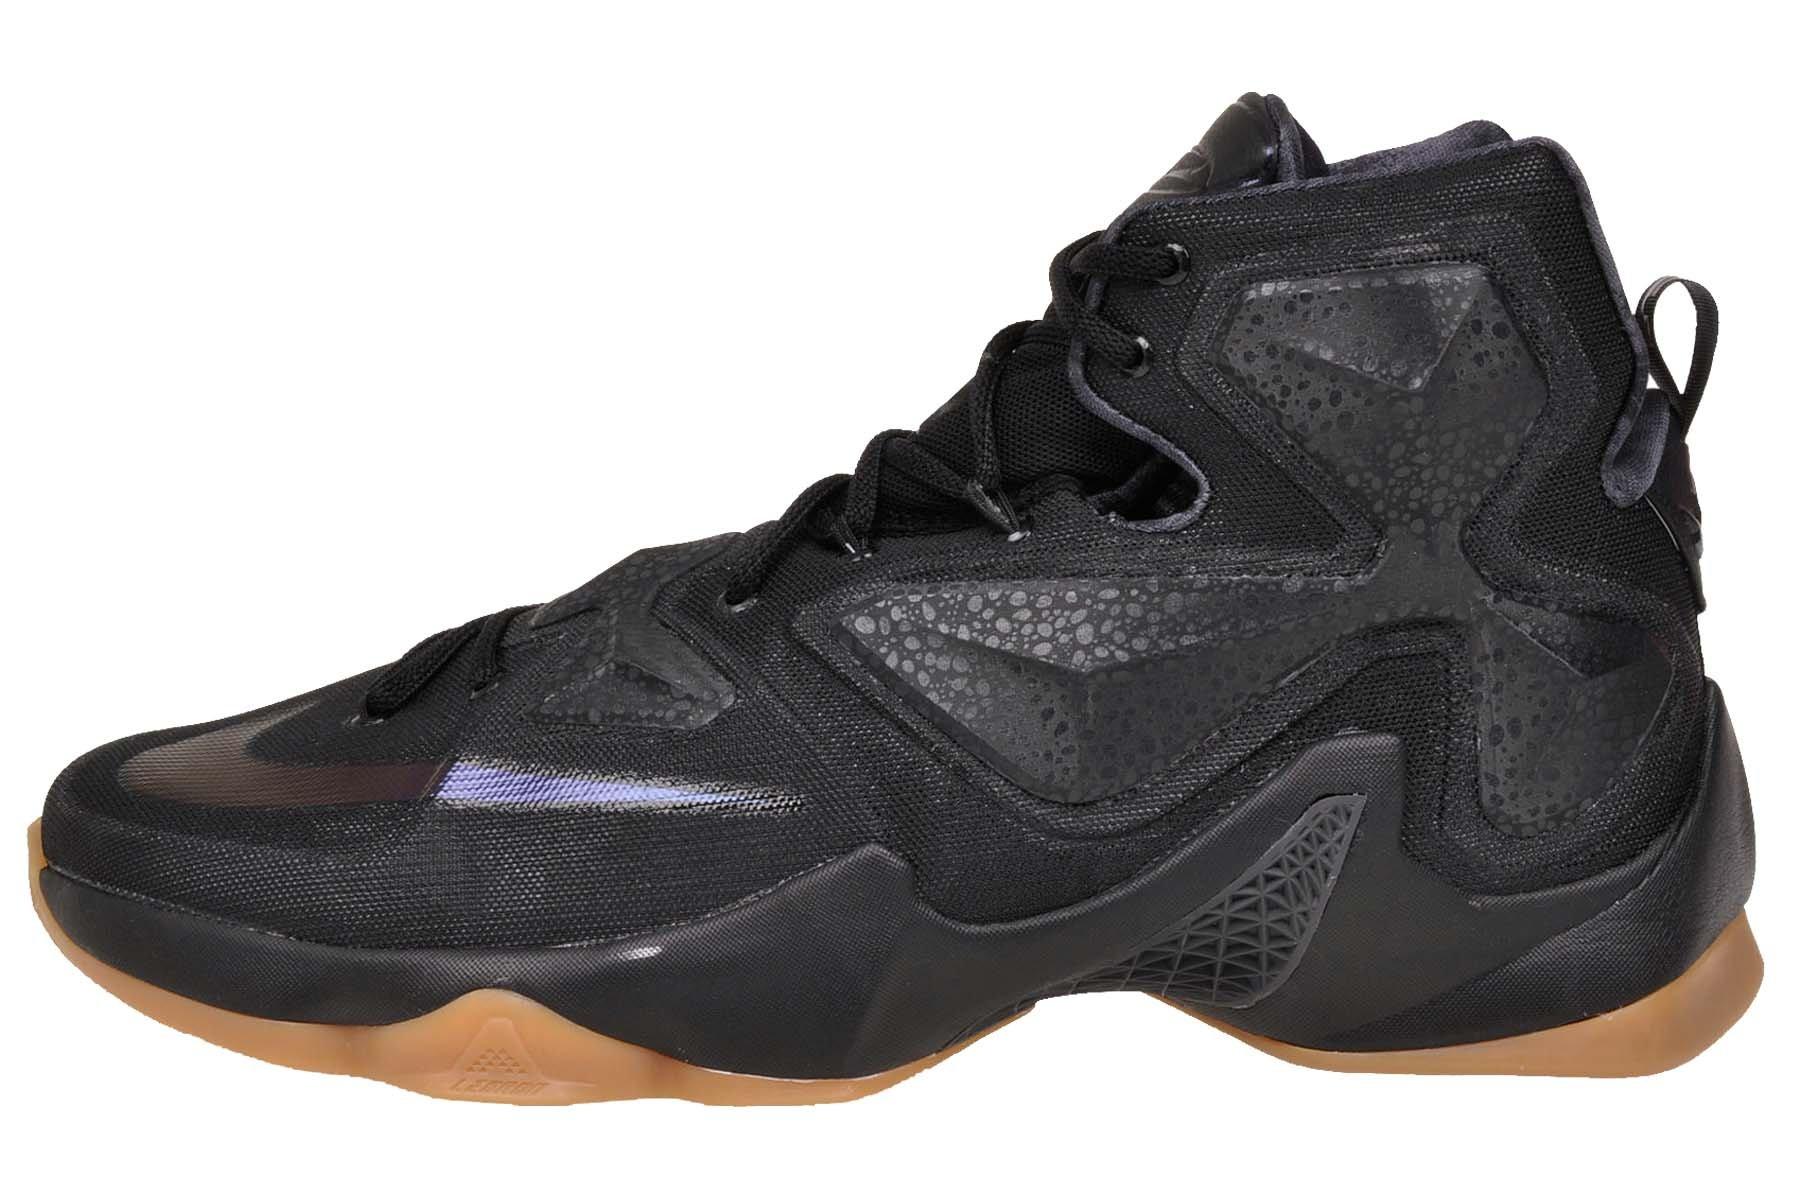 Nike Men's  Lebron XIII Black Basketball Shoe - 7.5 D(M) US